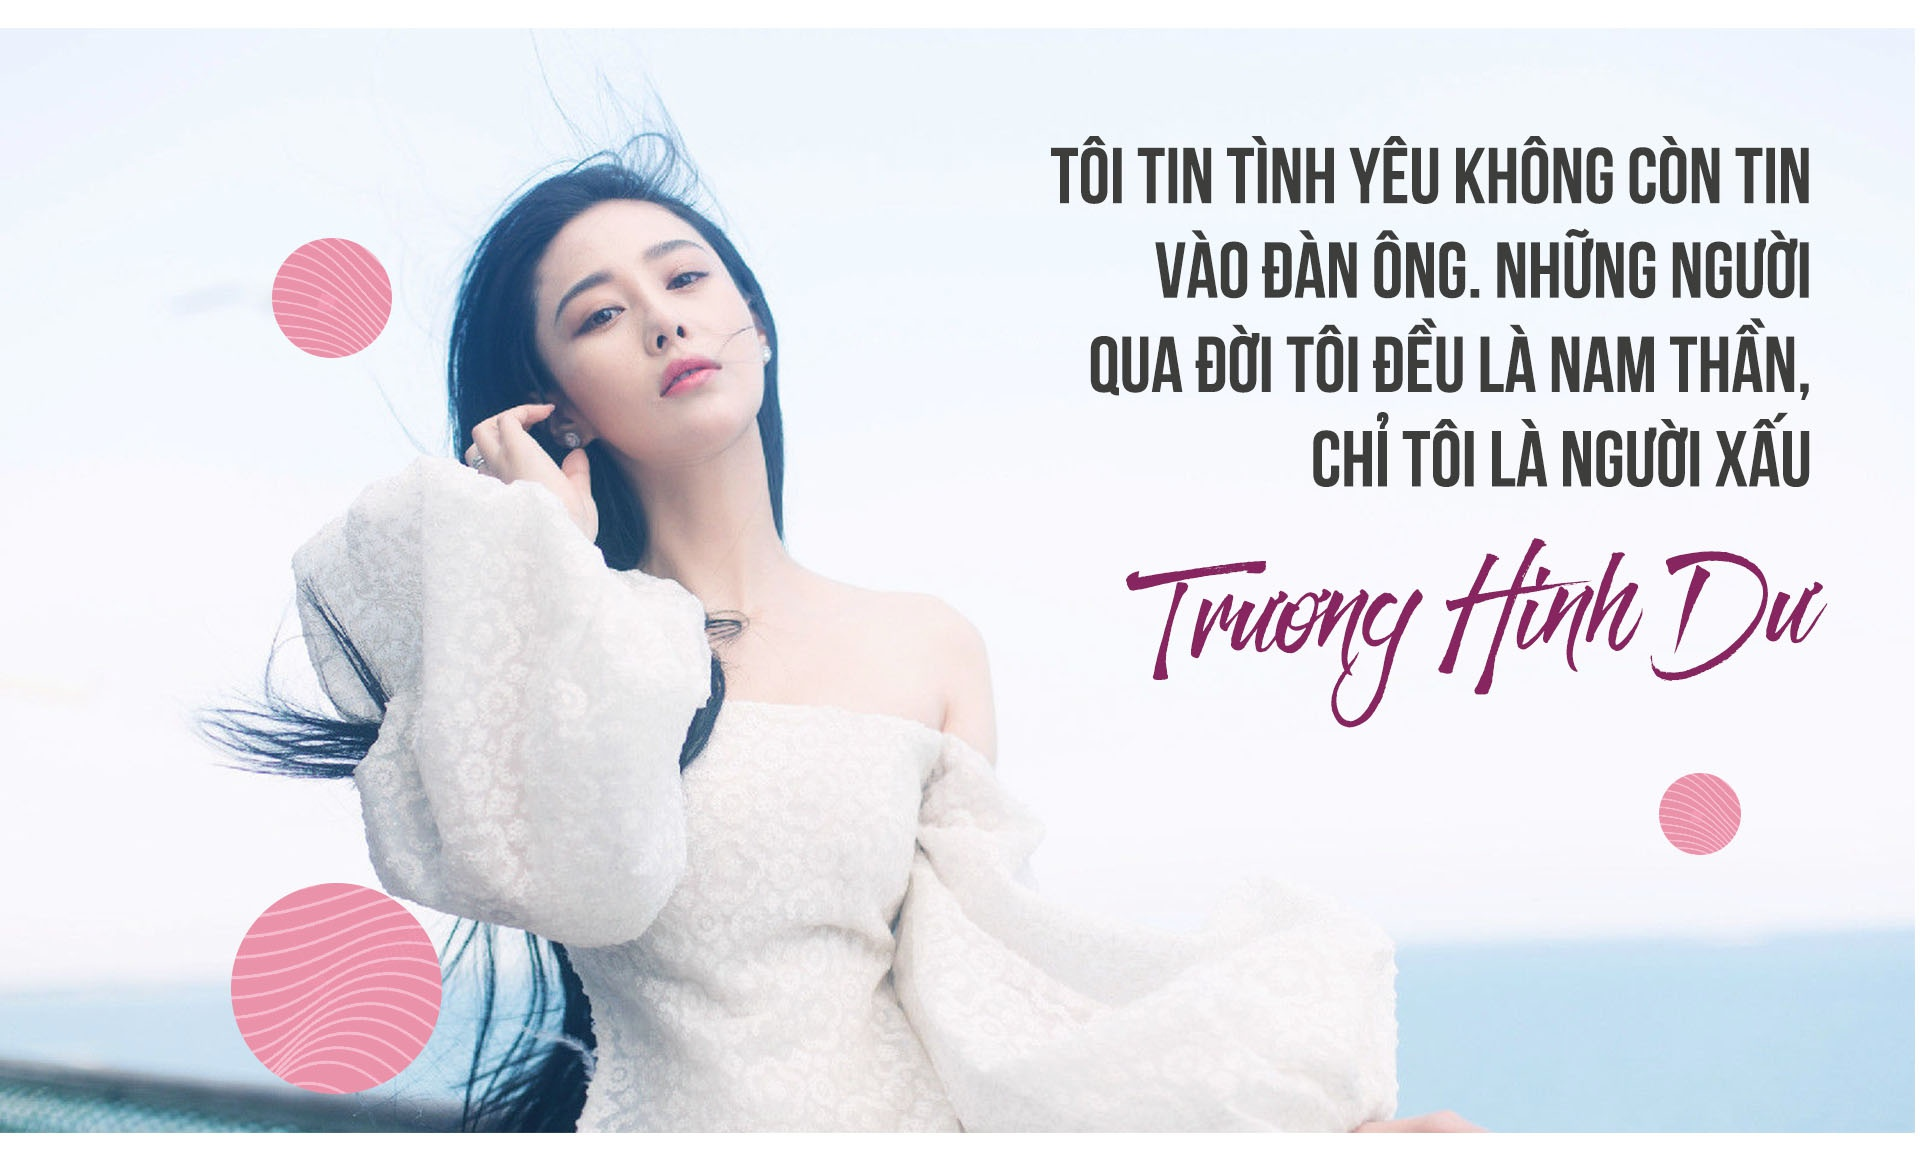 Truong Hinh Du: My nhan bi tieng ban dam, 5 nam got khong sach hinh anh 14